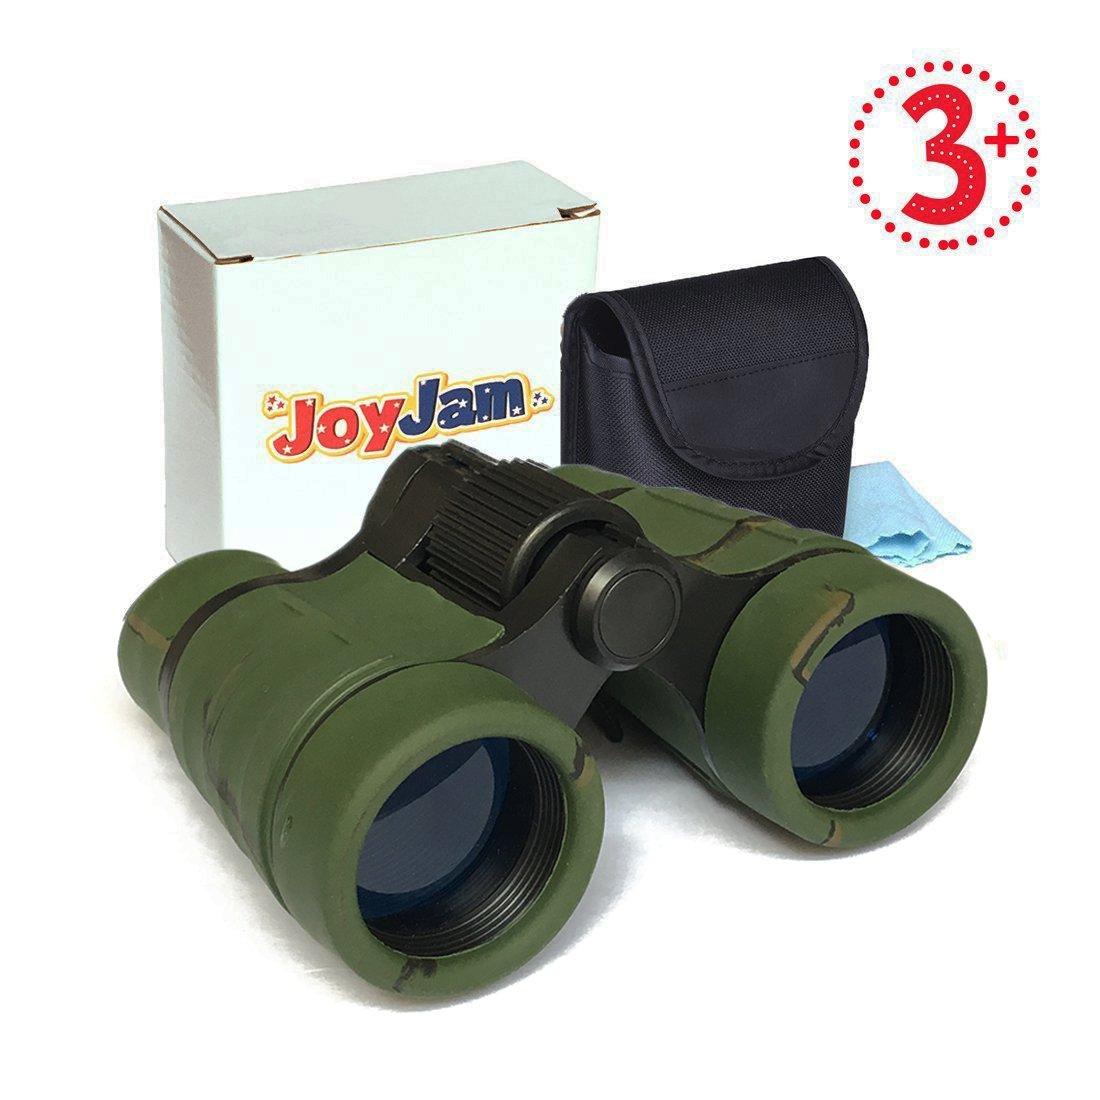 Joyjamコンパクト耐衝撃子供用双眼鏡、Best Gift For Boys & Girls (マルチカラー) B07BRCVYD6 迷彩 迷彩